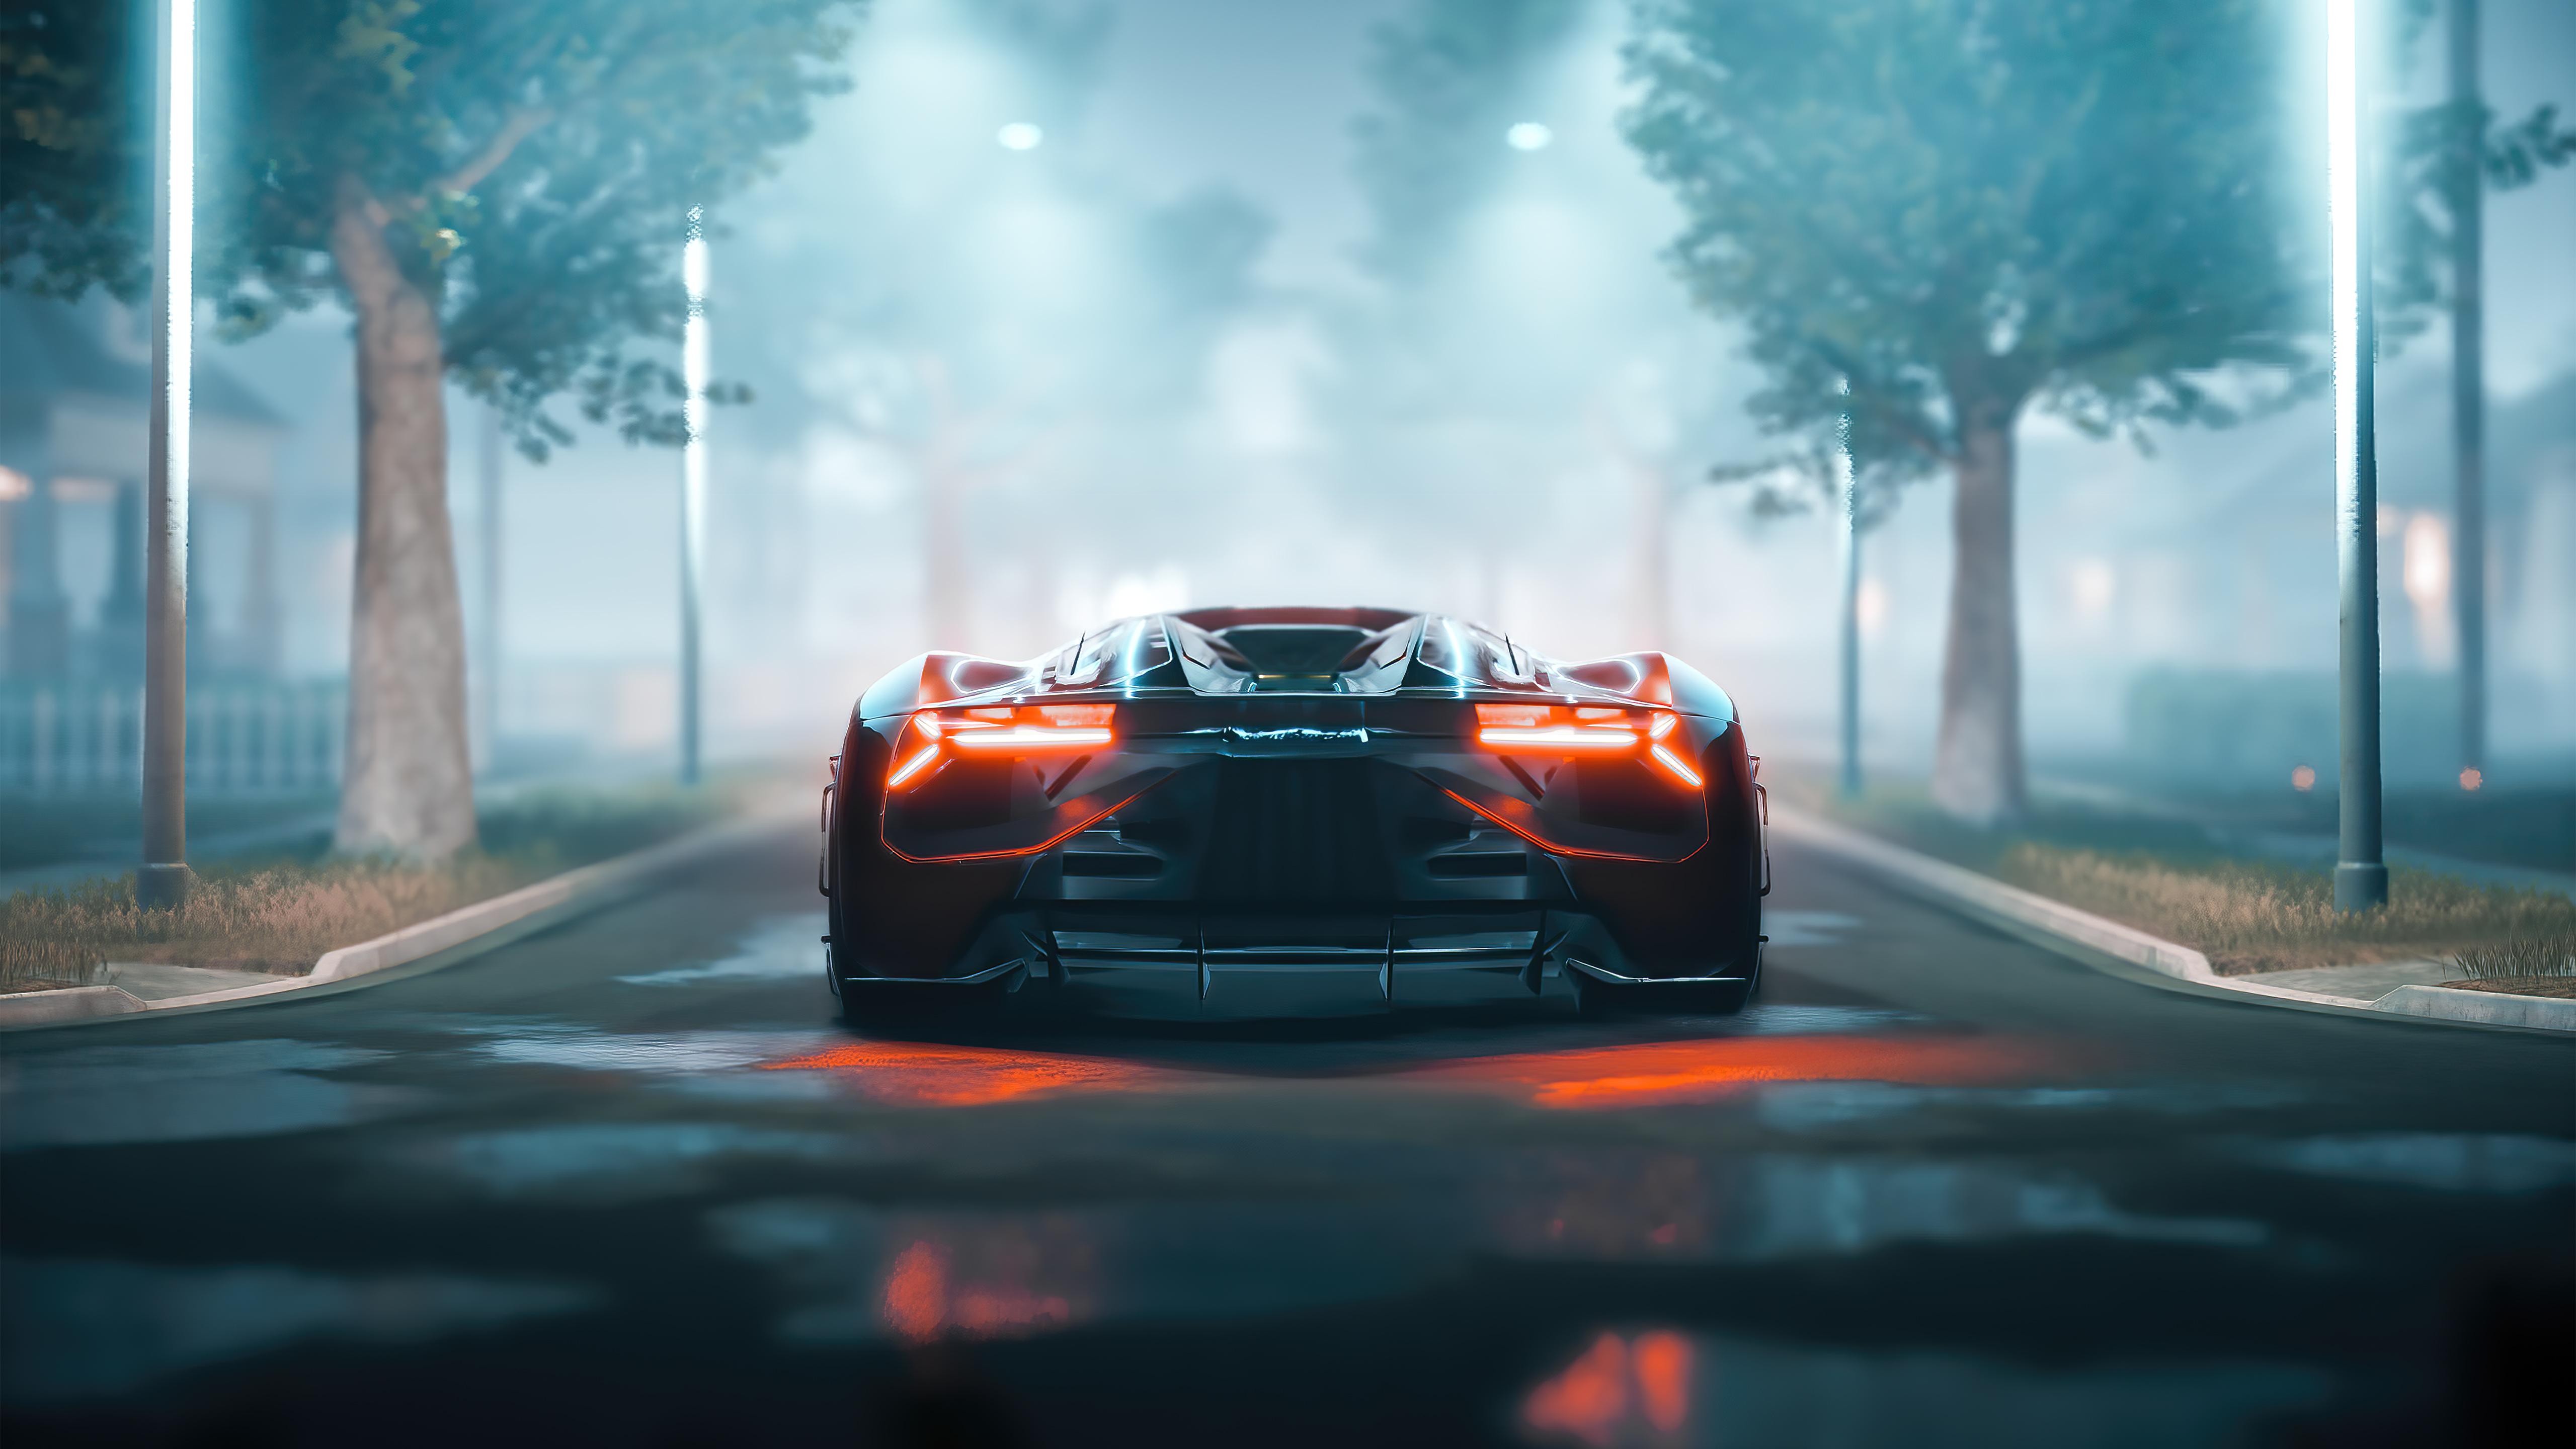 lamborghini terzo millennio rear 4k 1626180010 - Lamborghini Terzo Millennio Rear 4k - Lamborghini Terzo Millennio Rear 4k wallpapers